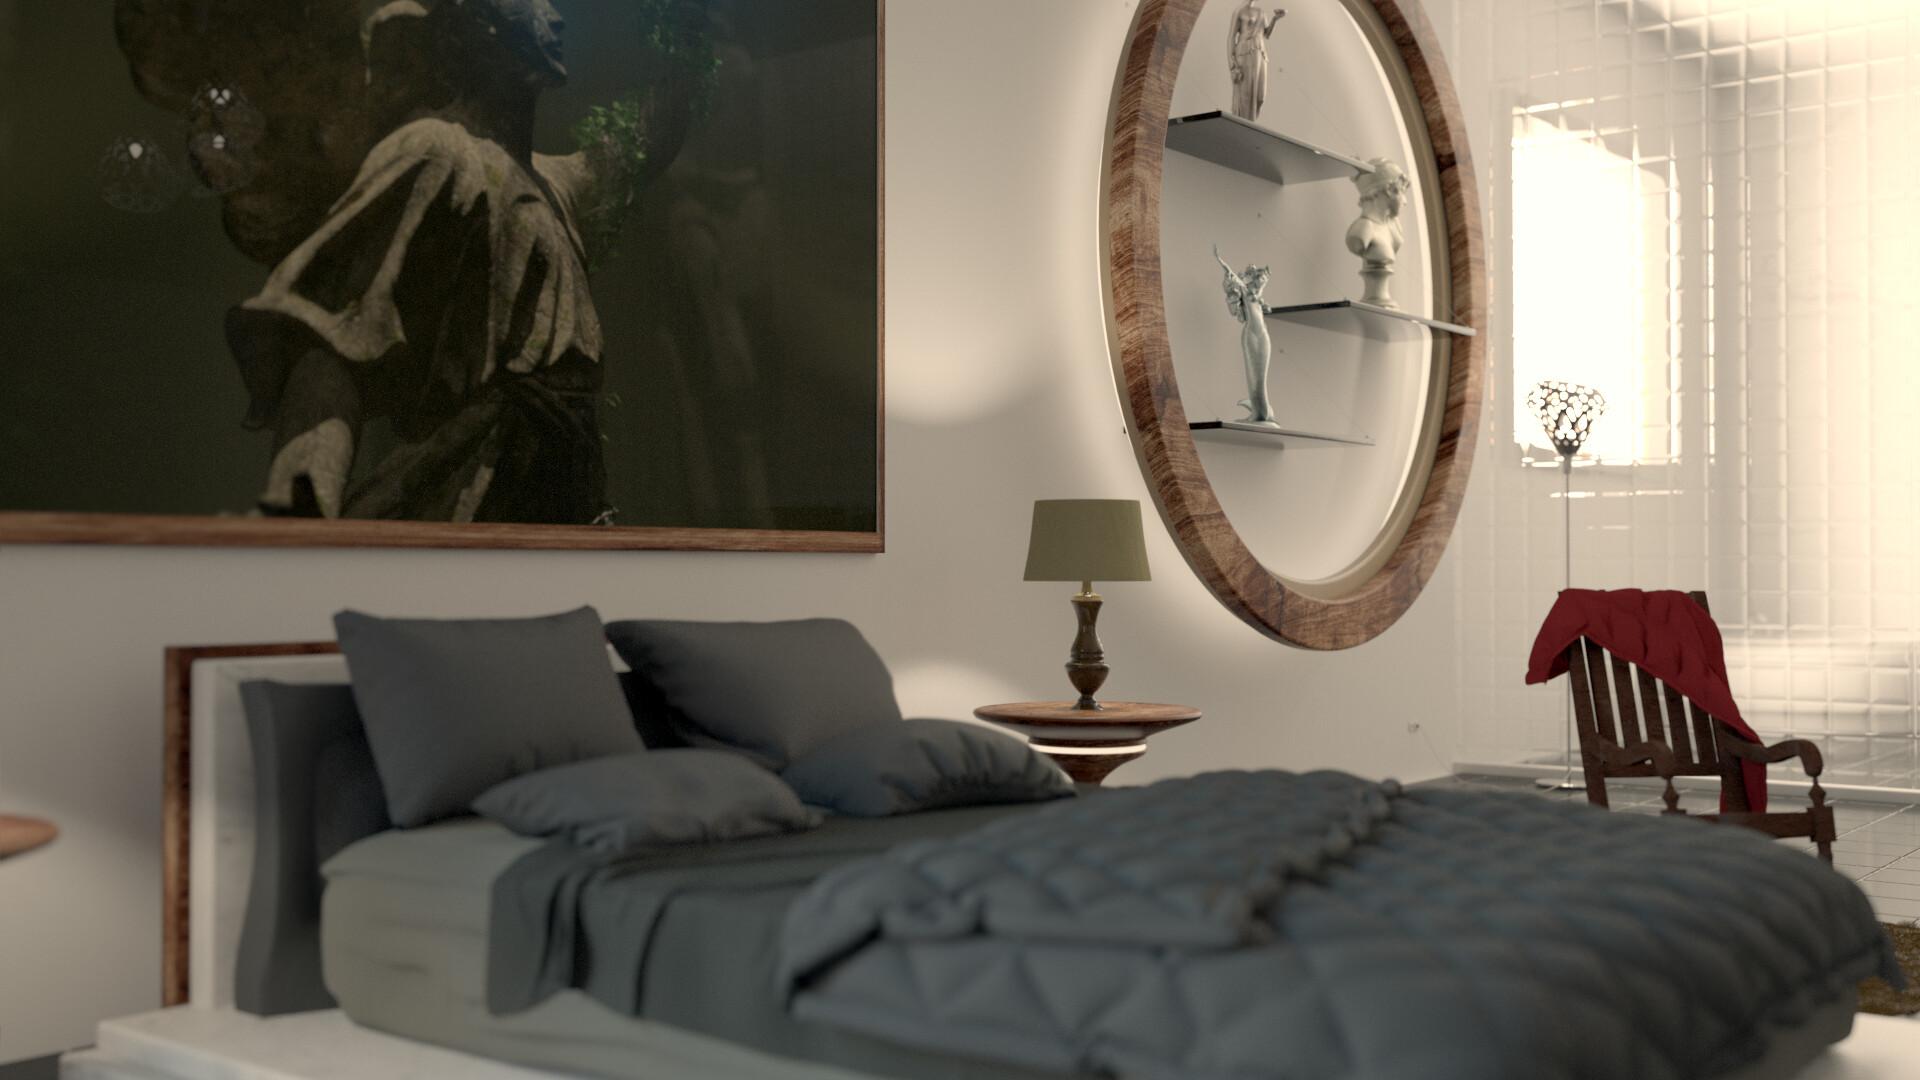 Artstation Realistic Bedroom Interior Design Picsell Global